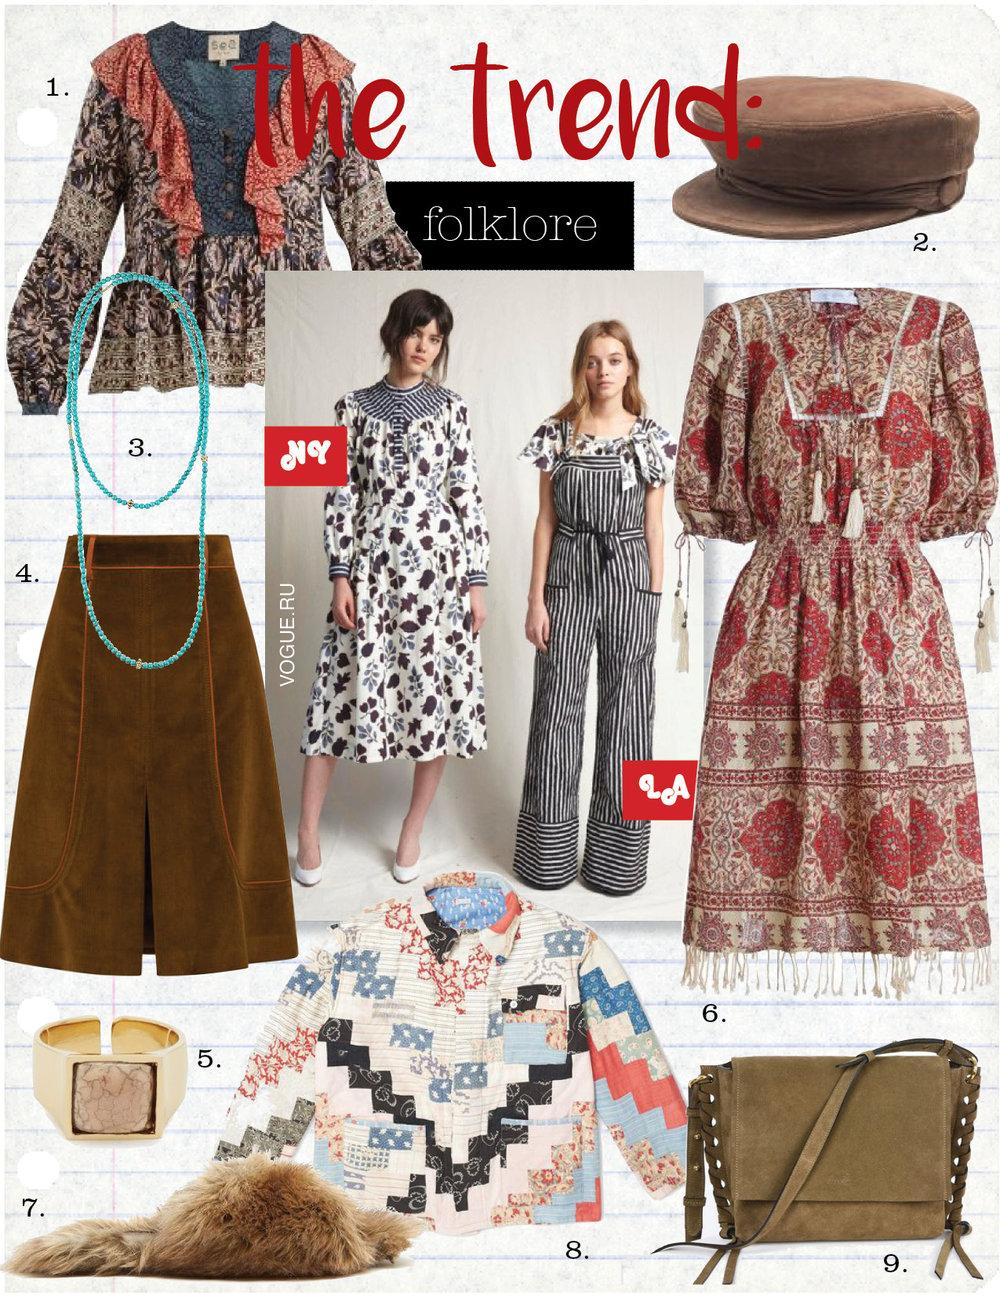 1. Sea maho border floral- print silk blouse, $437,  matchesfashion.com  2. maison michel new abby suede cap, $415,  matchesfashion.com  3. lagos 18k gold and turquoise single strand necklace, $600,  macys.com  4. prada corduroy skirt, $1350,  prada.com  5. isabel marant stone - embellished ring, $191,  matchesfashion.com  6. zimmerman tulsi border day dress, $640,  zimmermannwear.com  7. simone rocha faux - fur slides, $406,  matchesfashion.com  8. bode farm quilted workwear jacket, $1454,  bodenewyork.com  9. isabel marant asli suede calfskin shoulder bag, $590,  isabelmarant.com